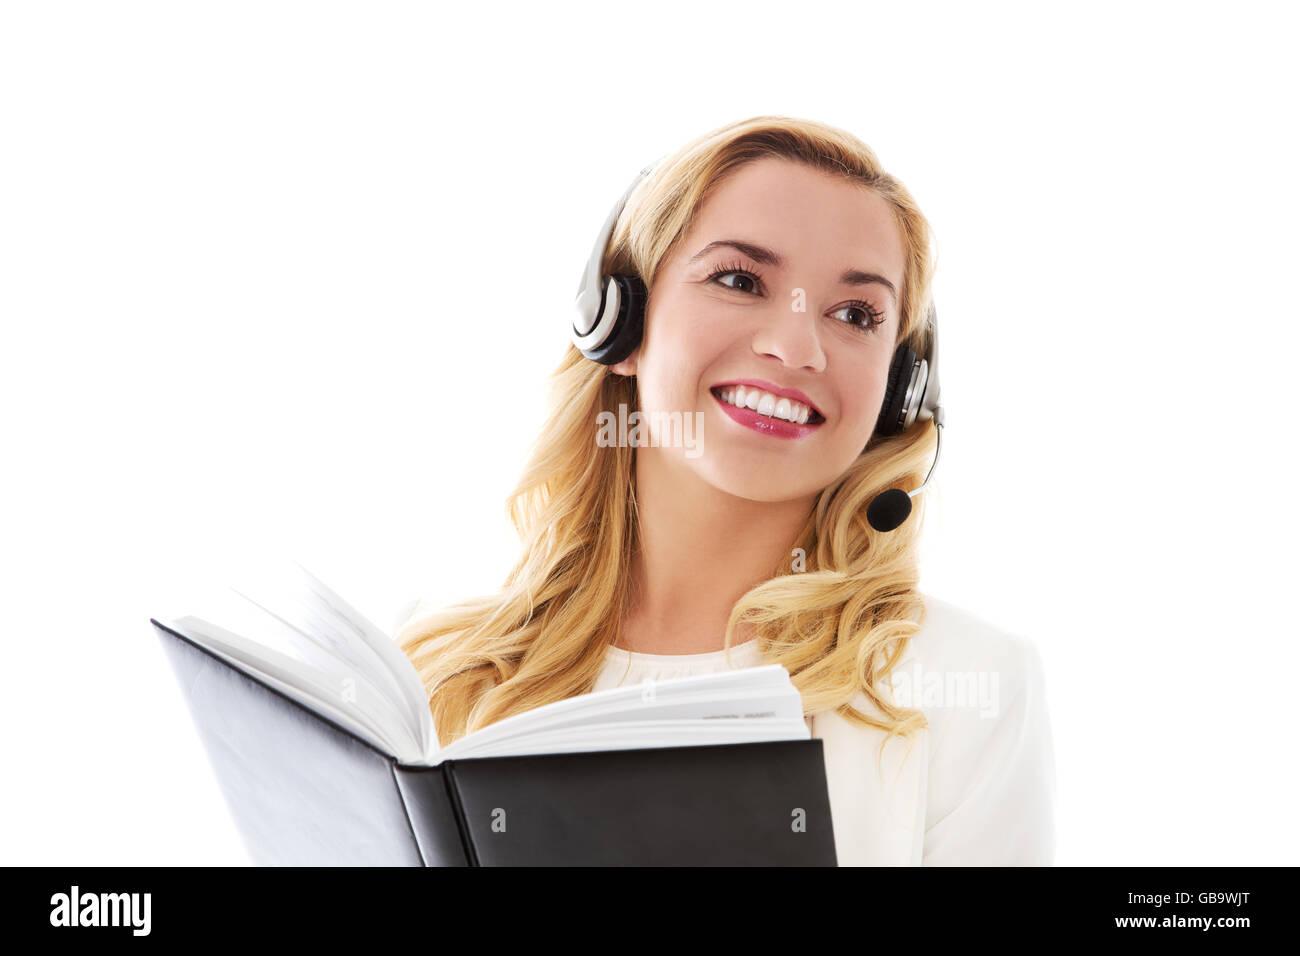 Closeup portrait of female customer service representative wearing headset. Stock Photo